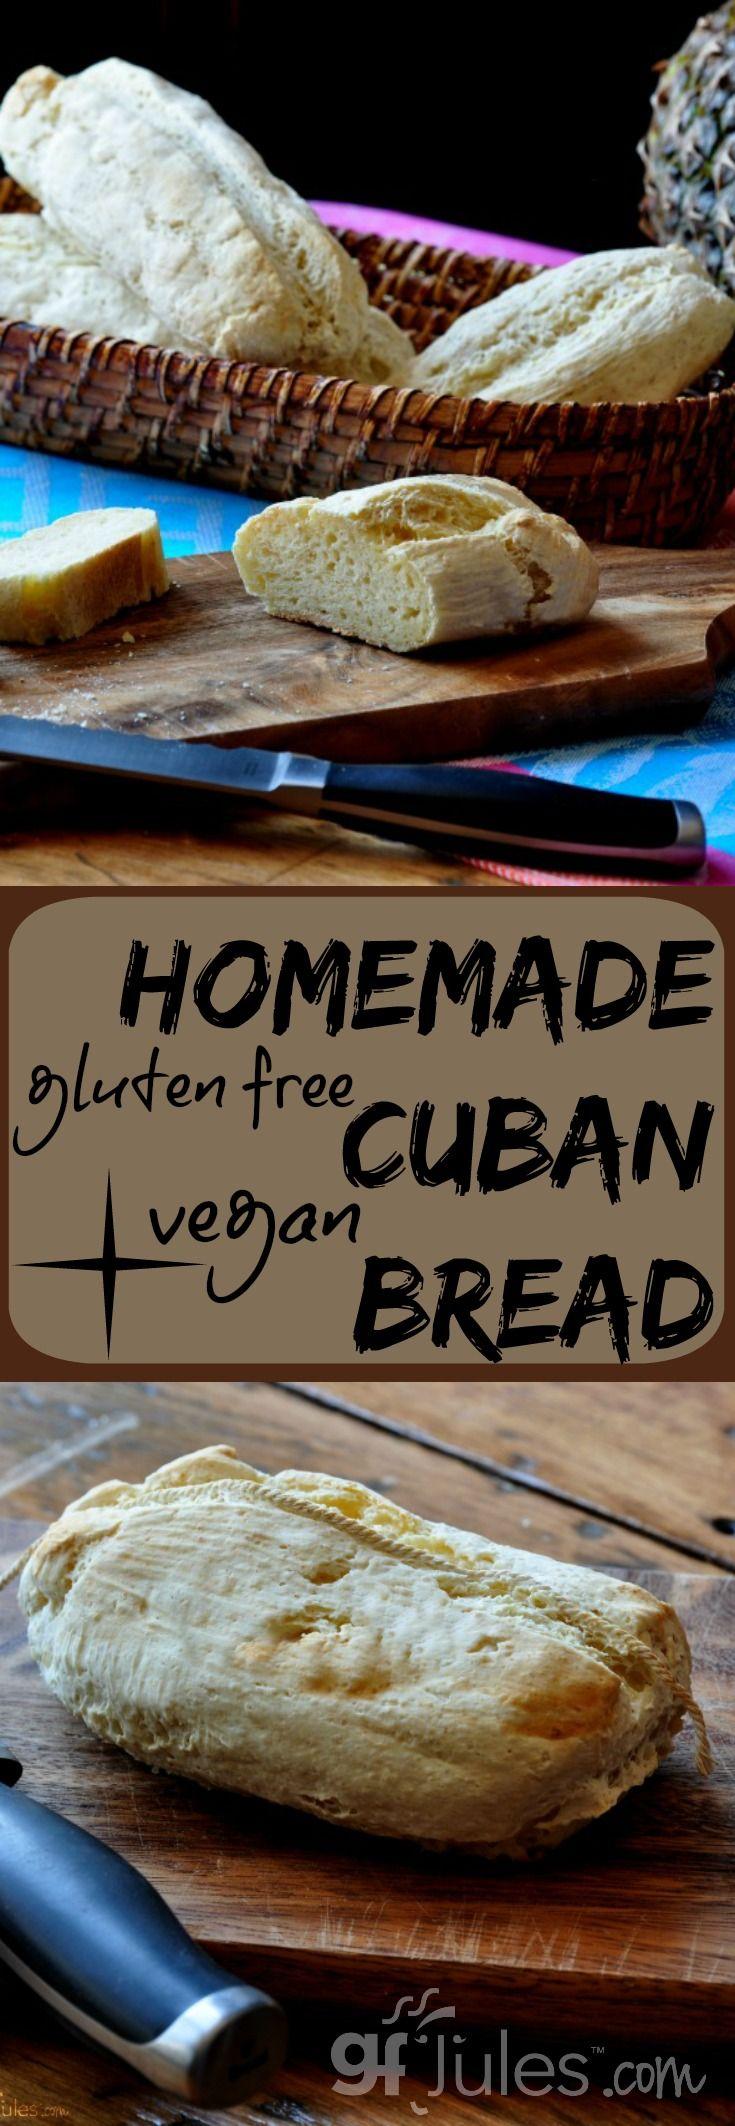 "Gluten Free & Vegan Cuban Bread ... tastes like ""Real Cuban Bread!"" Makes incredible sandwiches, too!"